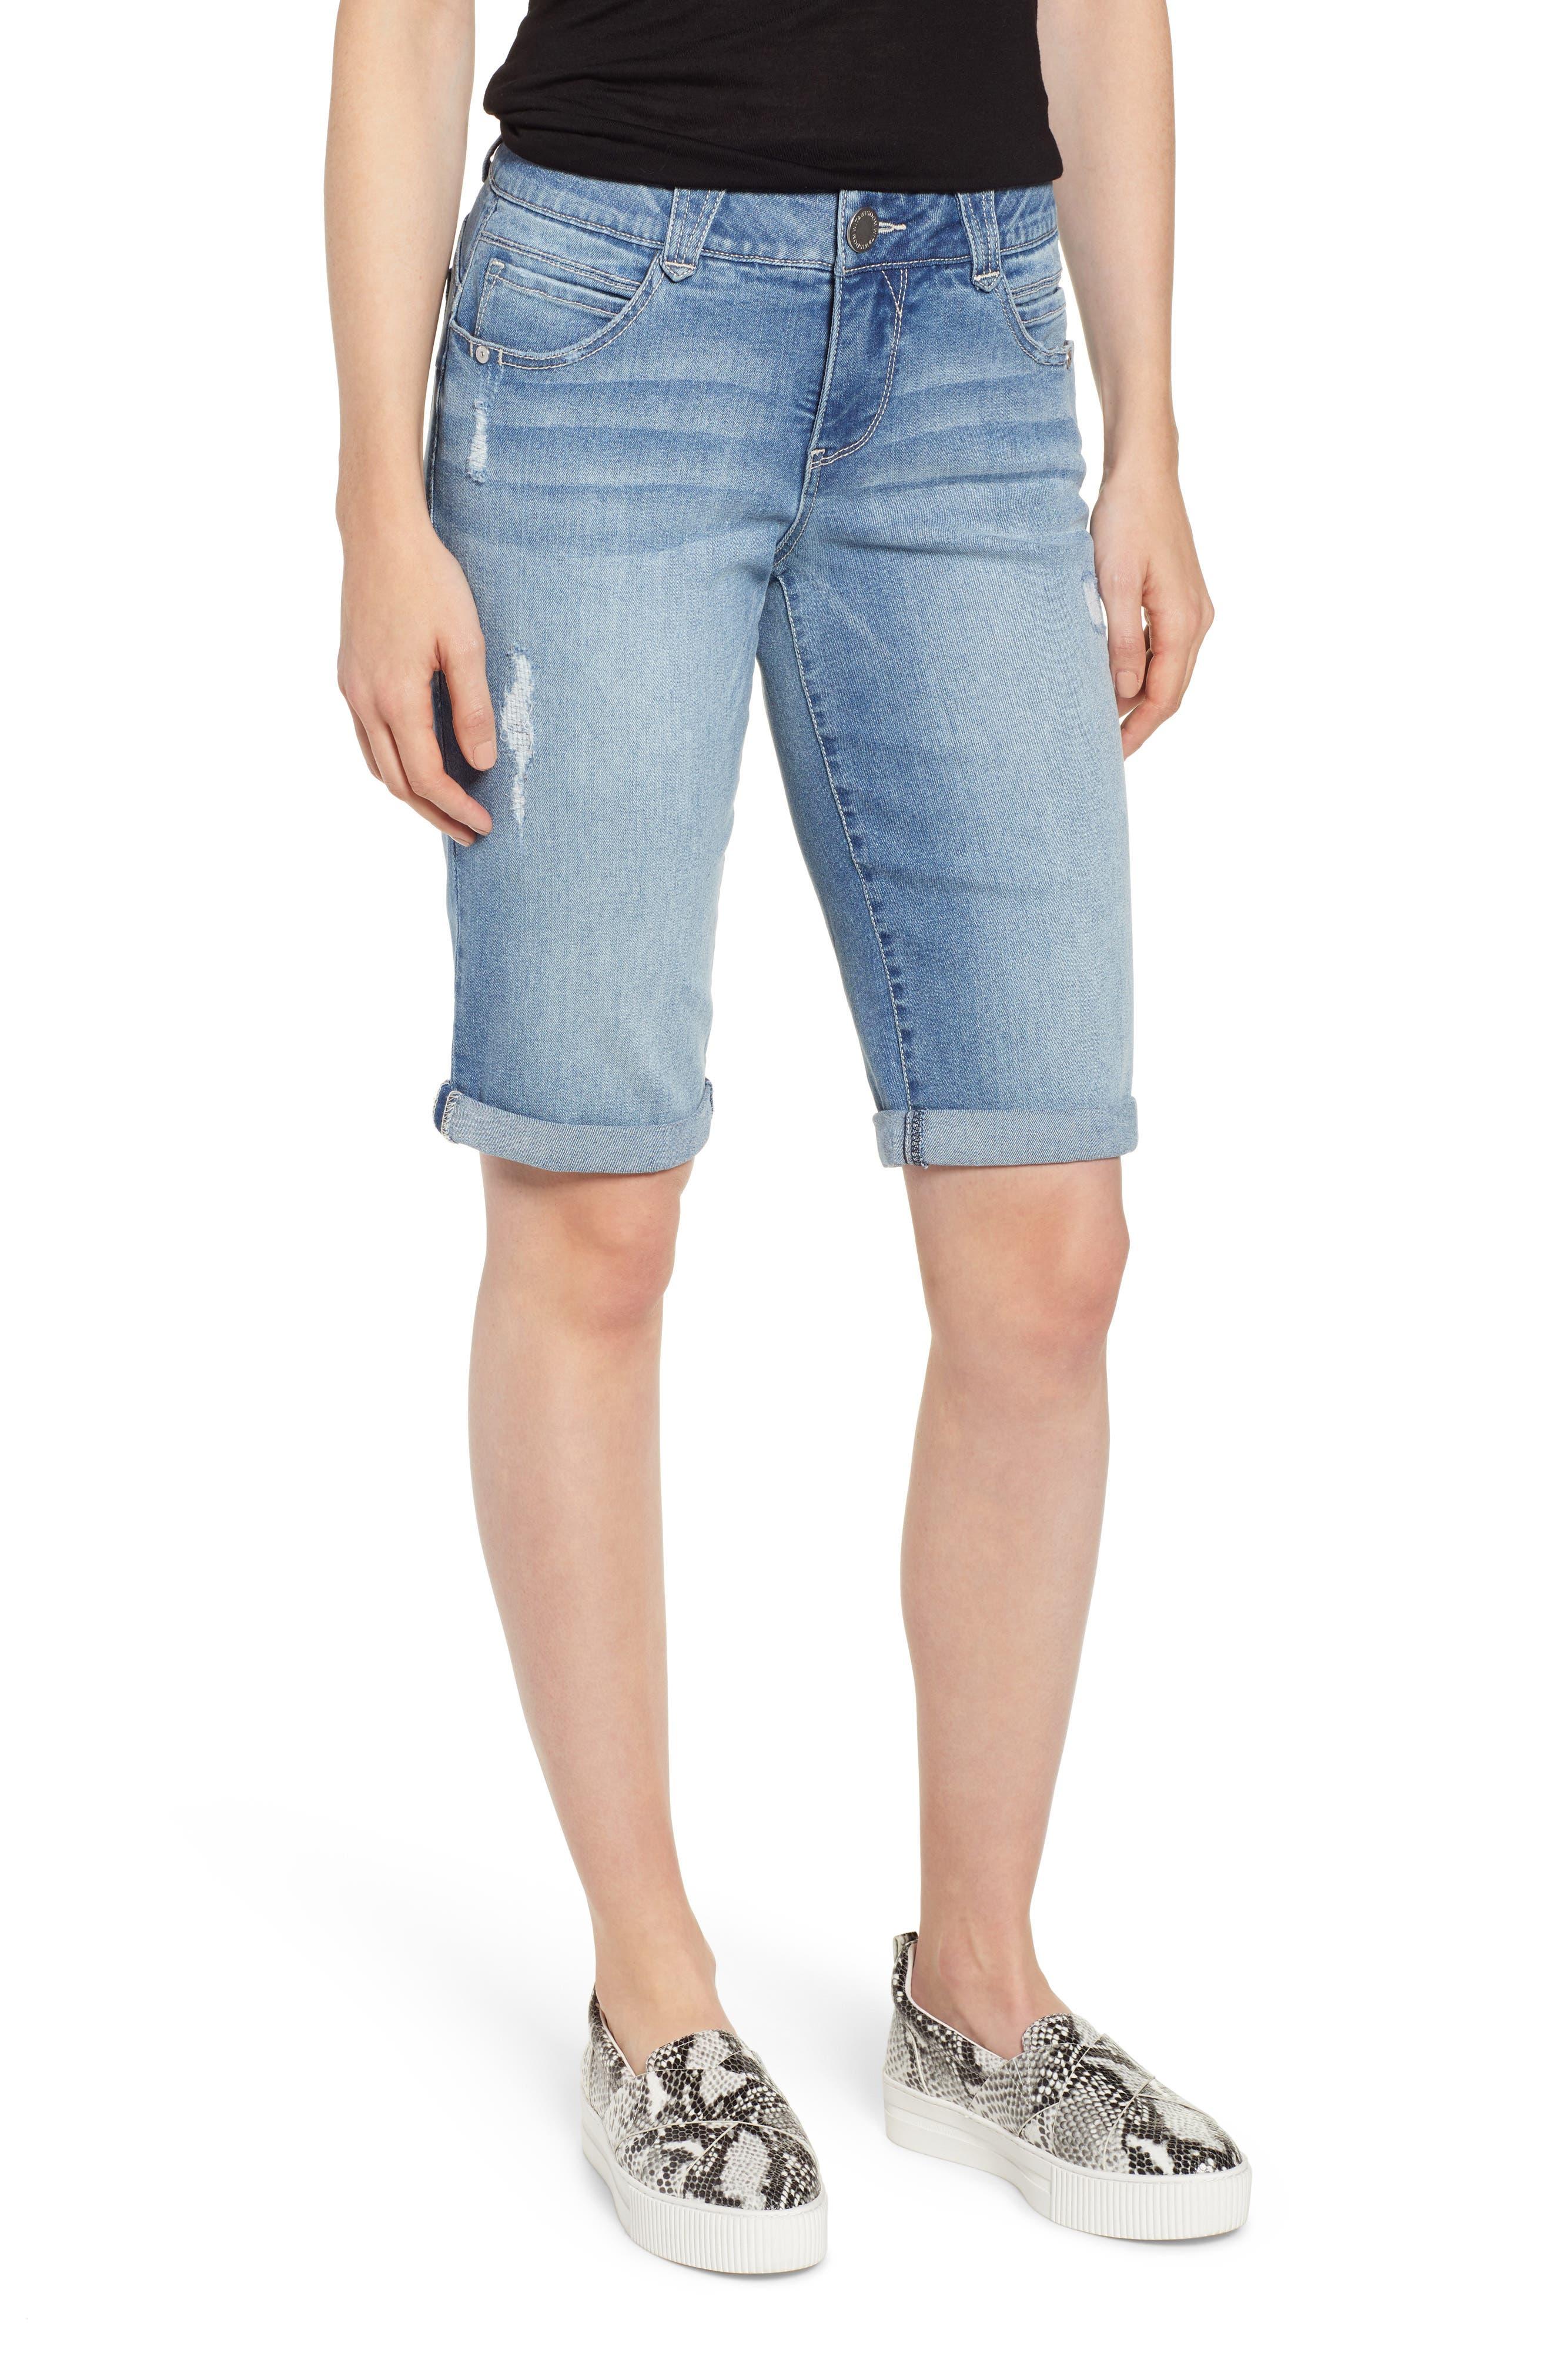 Women's Wit & Wisdom Ab-Solution Roll Cuffed Jean Shorts